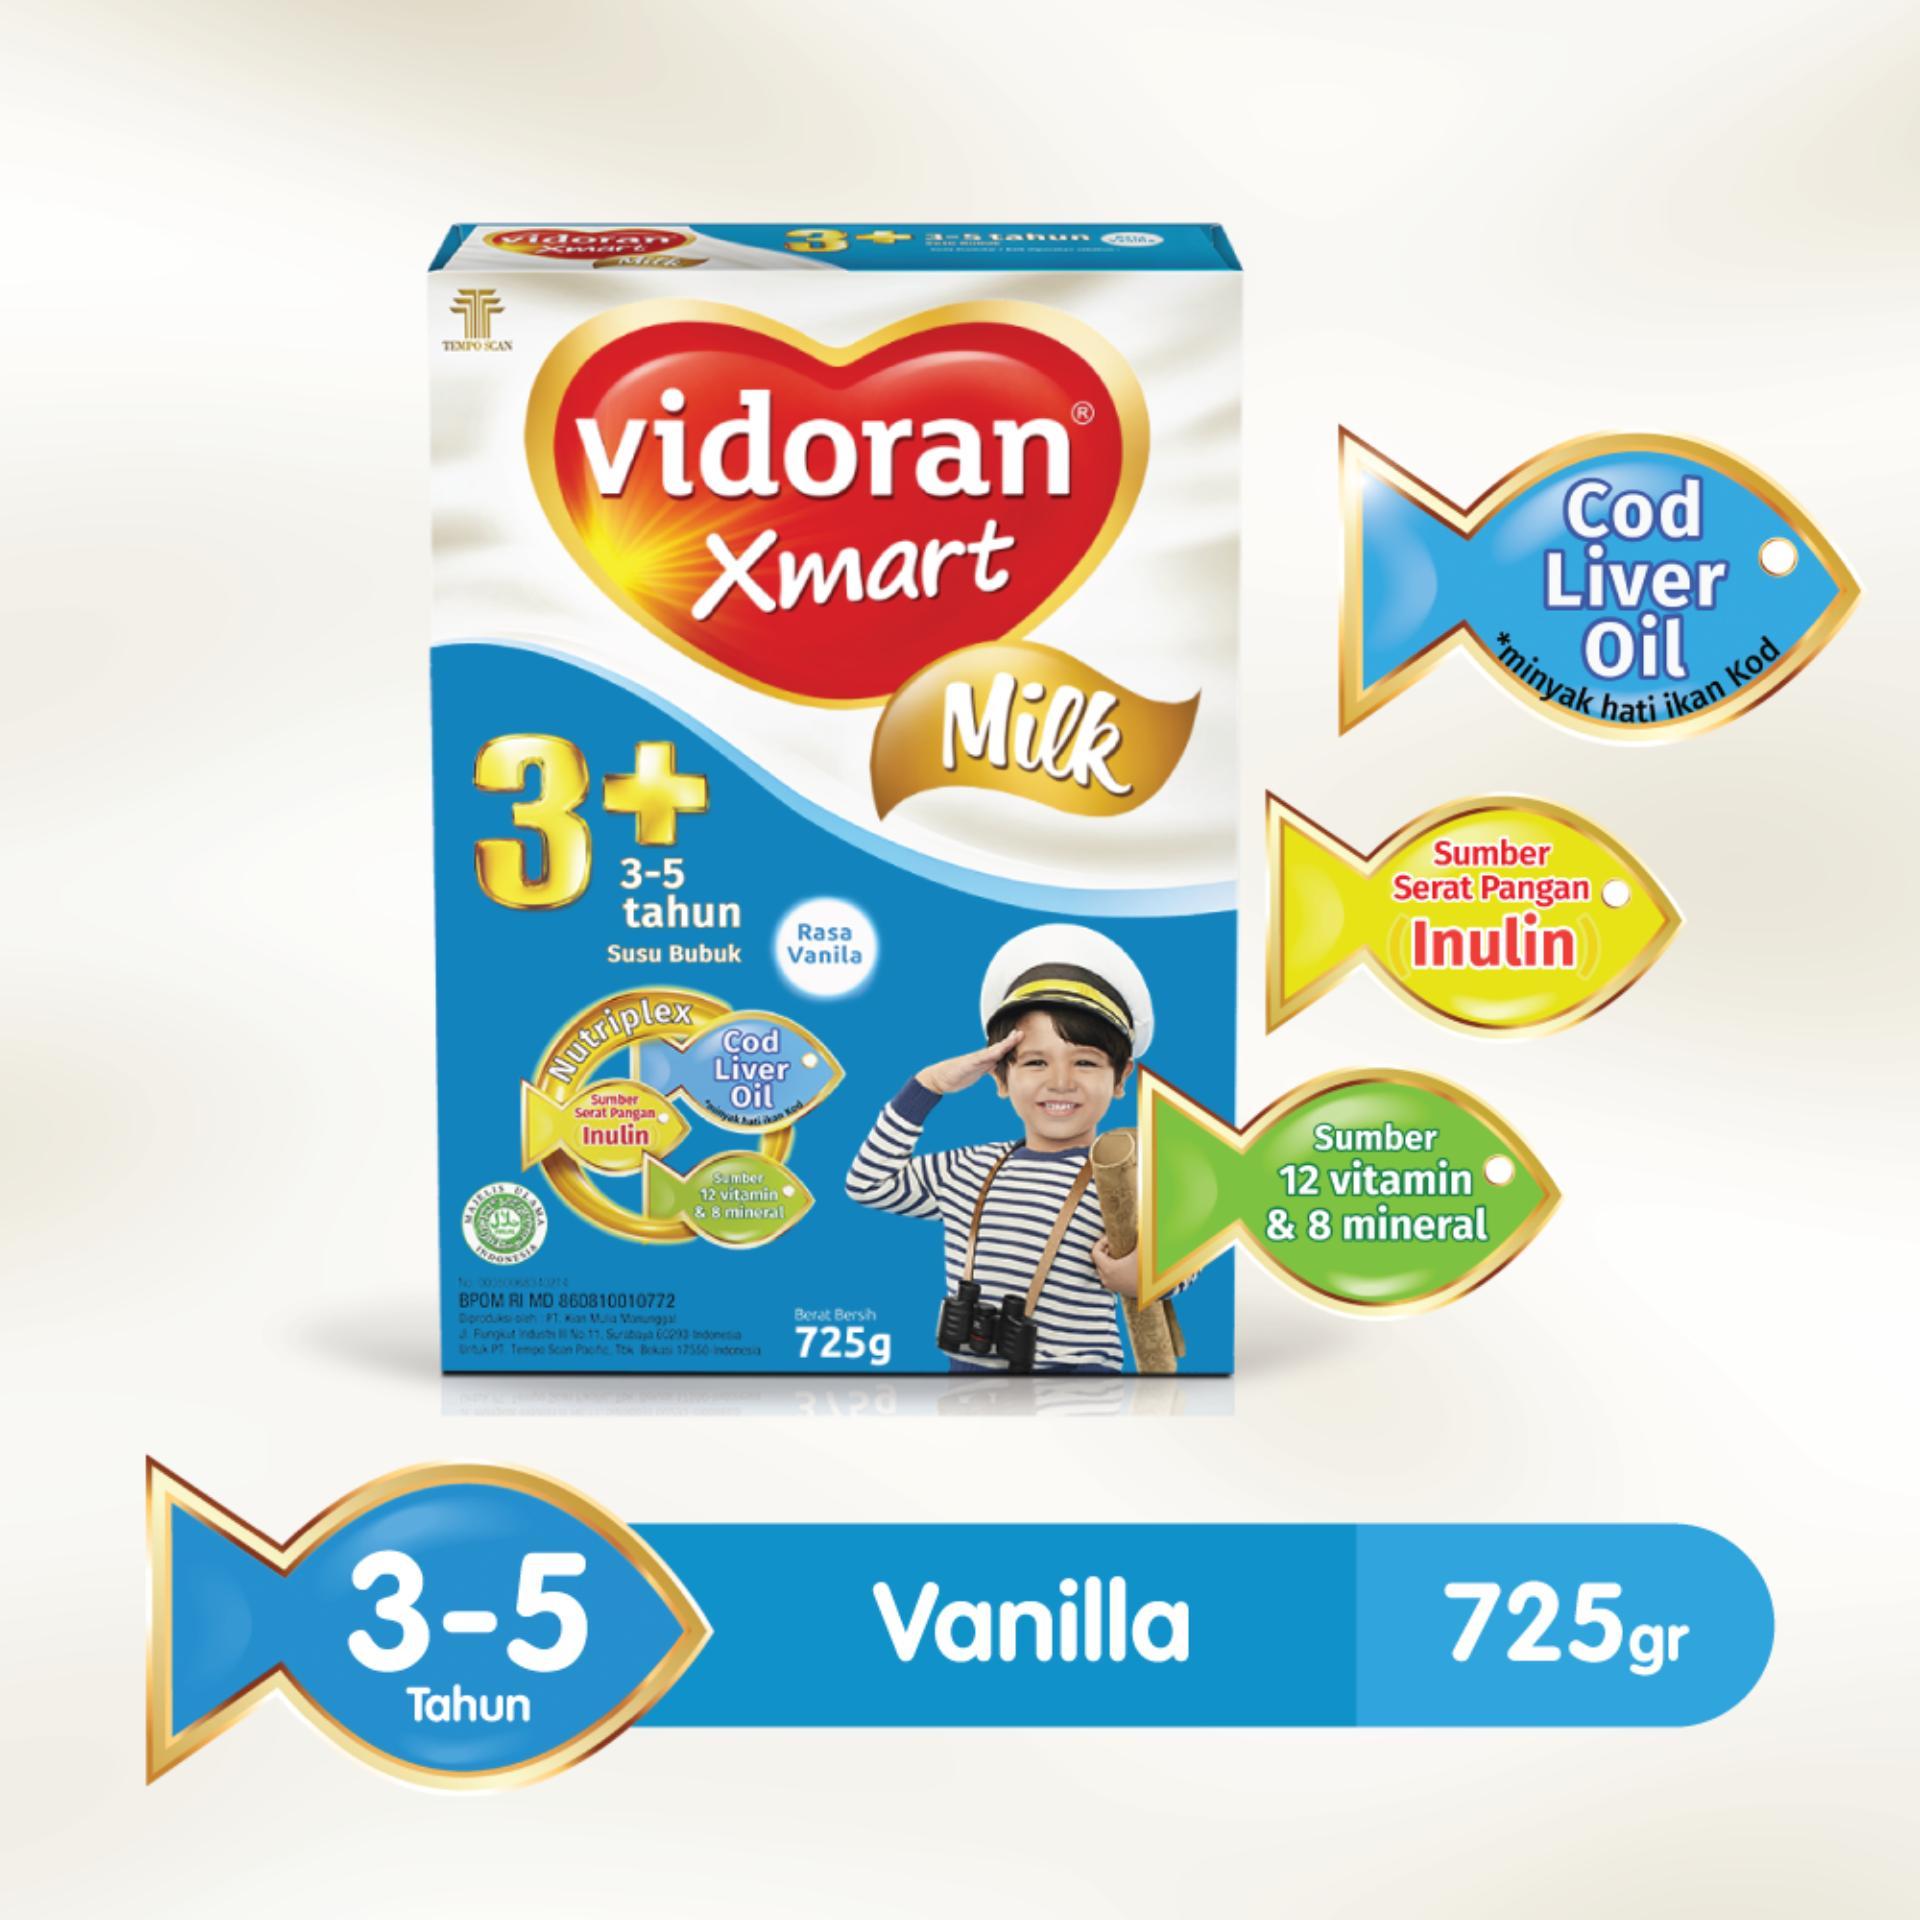 Susu Formula Bayi Terbaik Termurah Bebelac 4 Vanilla Madu 400gr Vidoran Xmart 3 Nutriplex 725 G